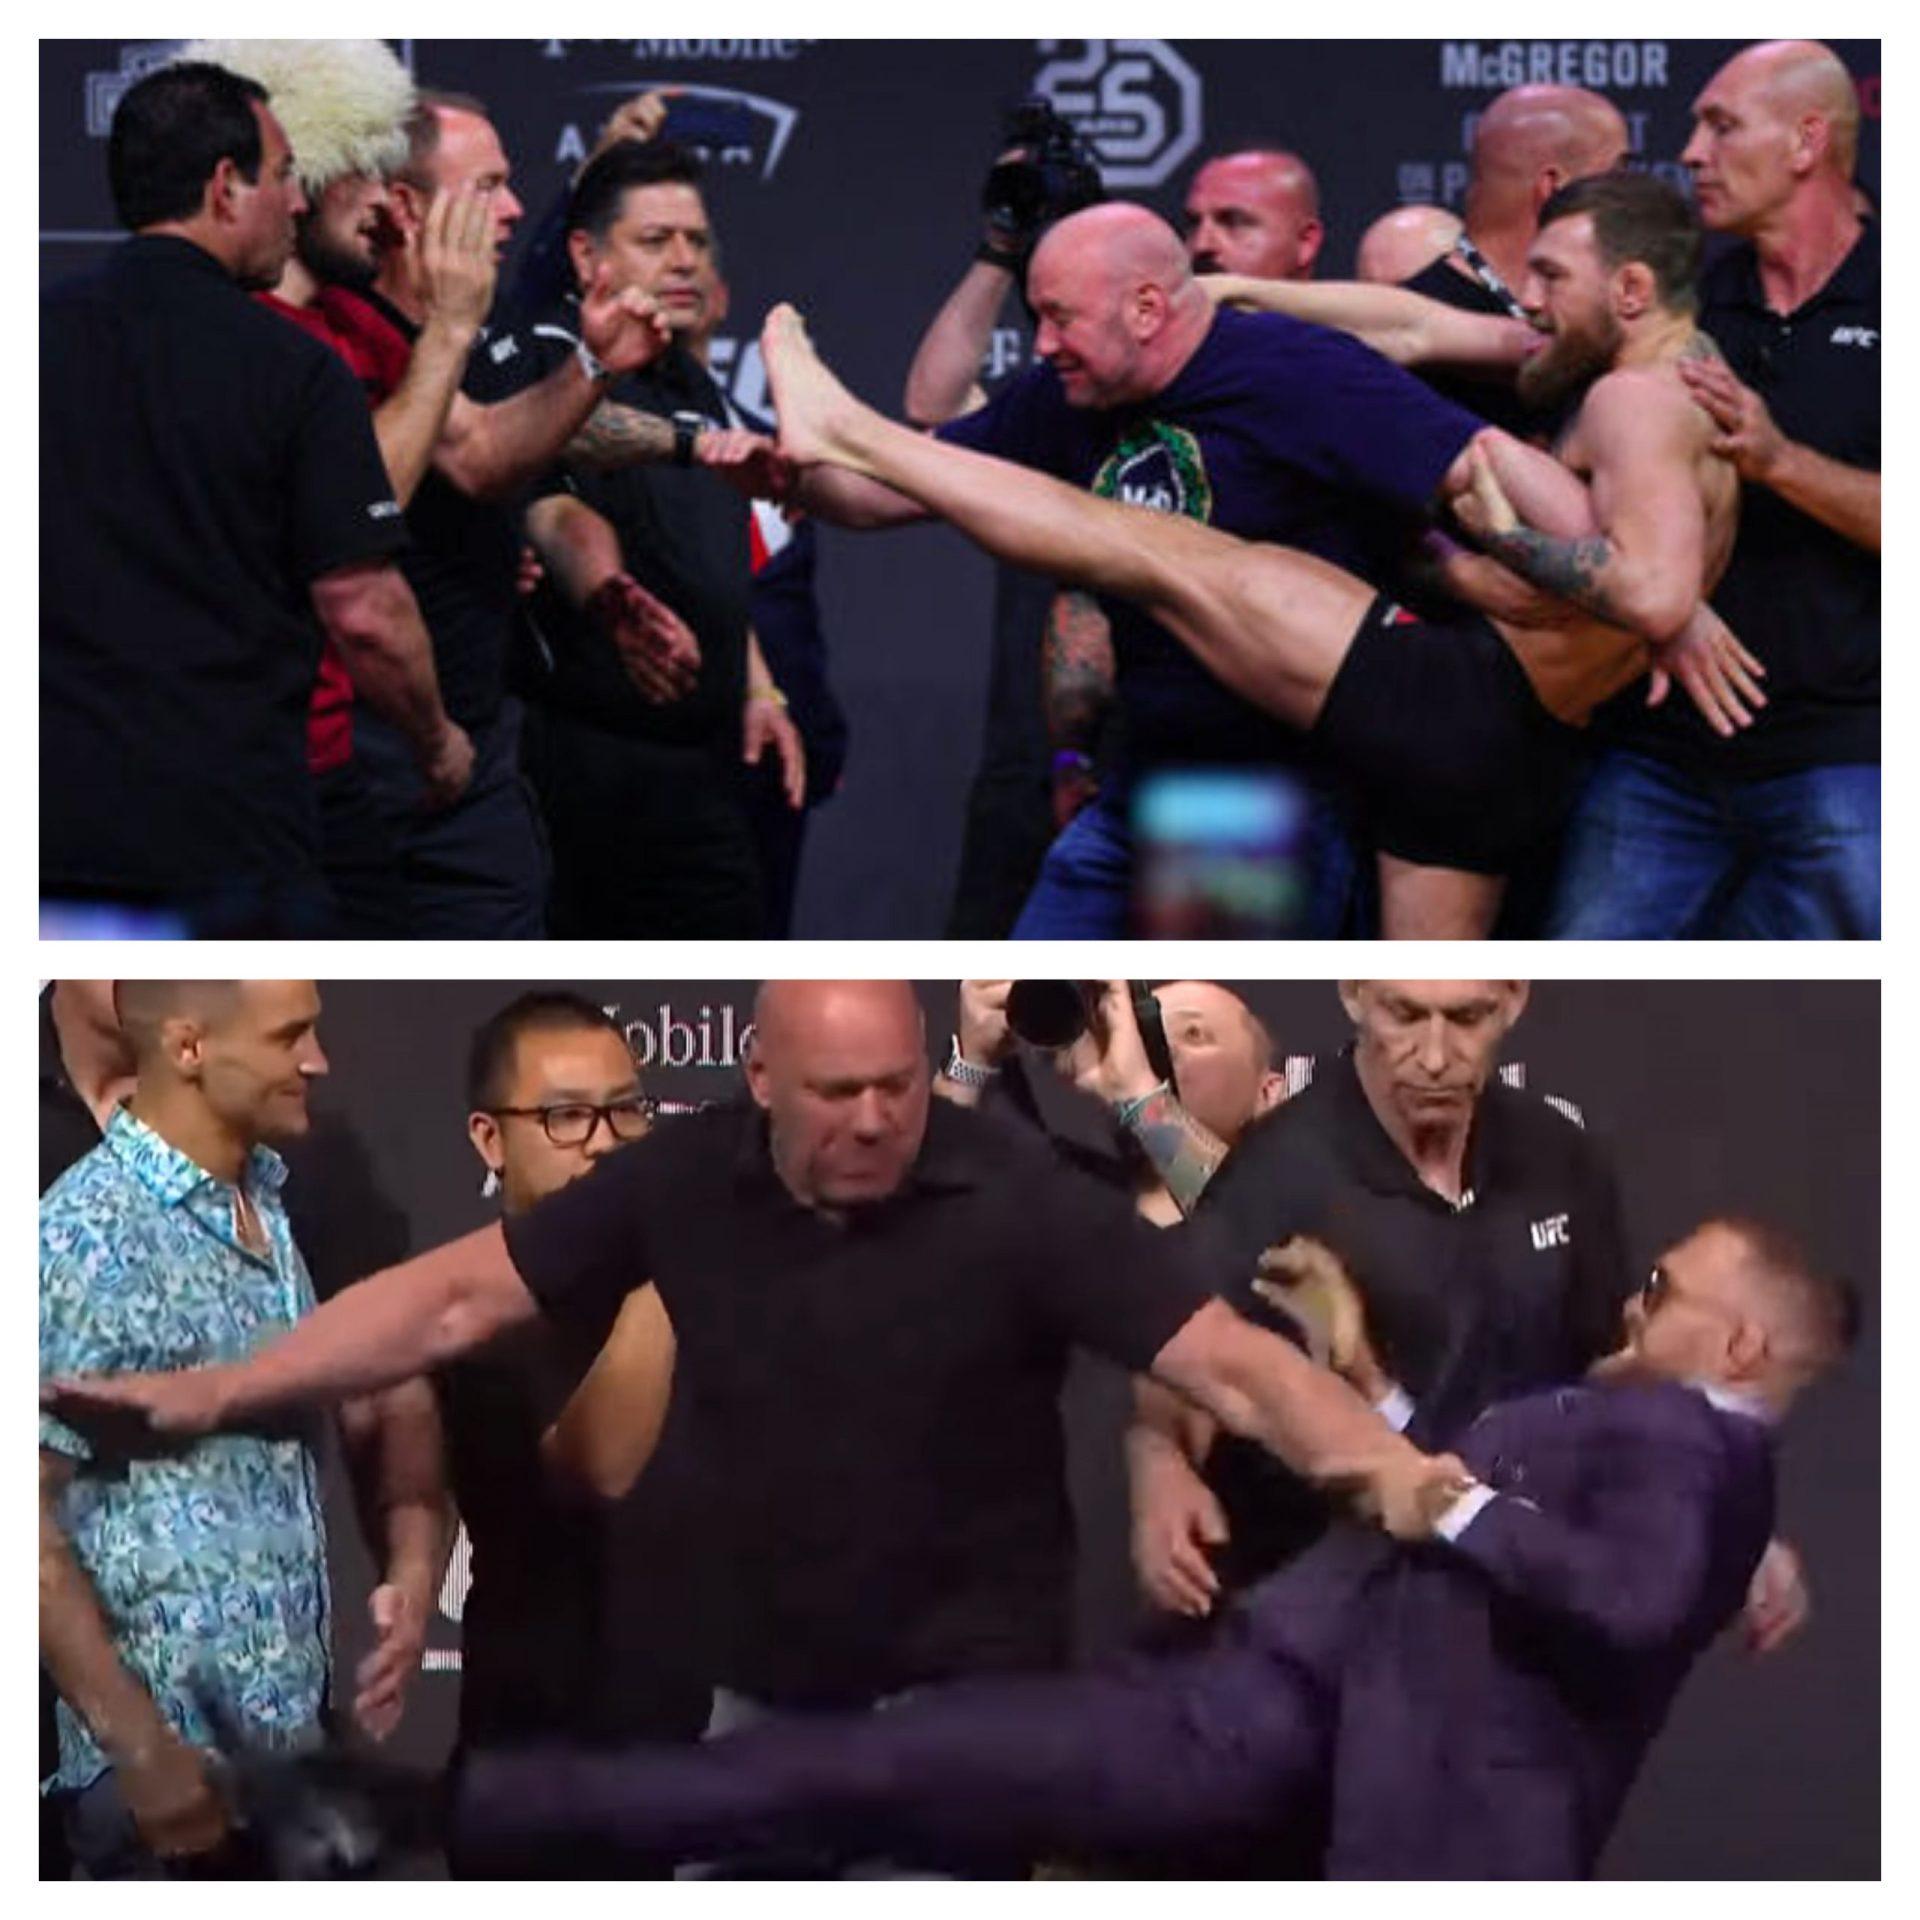 Watch: Conor McGregor leg kicks Dustin Poirier at UFC 264 press conference - McGregor